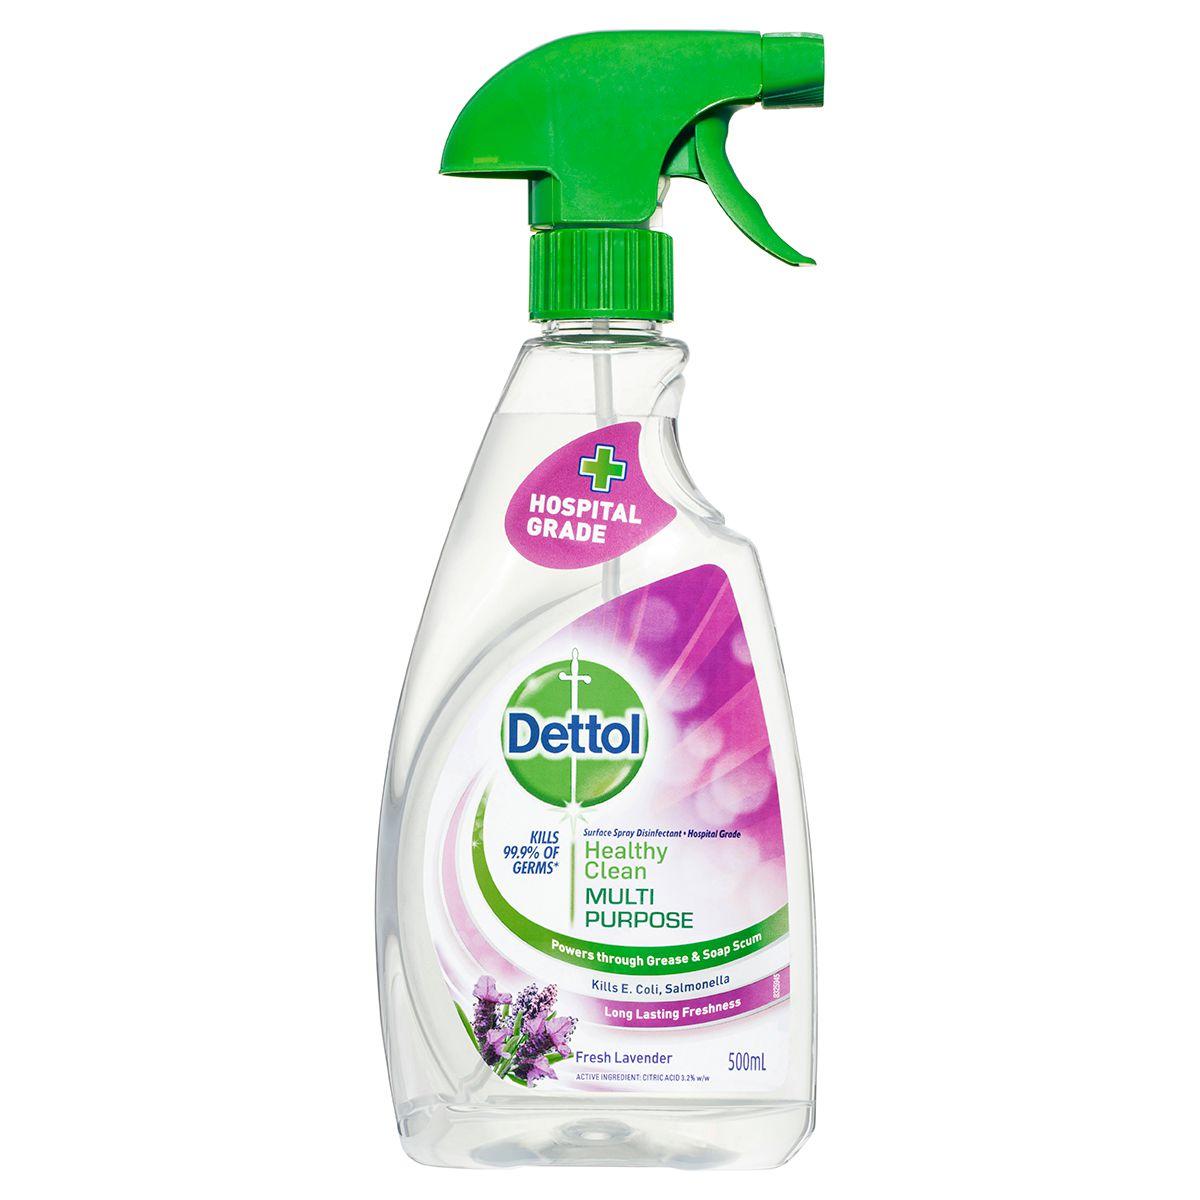 Dettol Healthy Clean Multipurpose Trigger Fresh Lavender 500ml